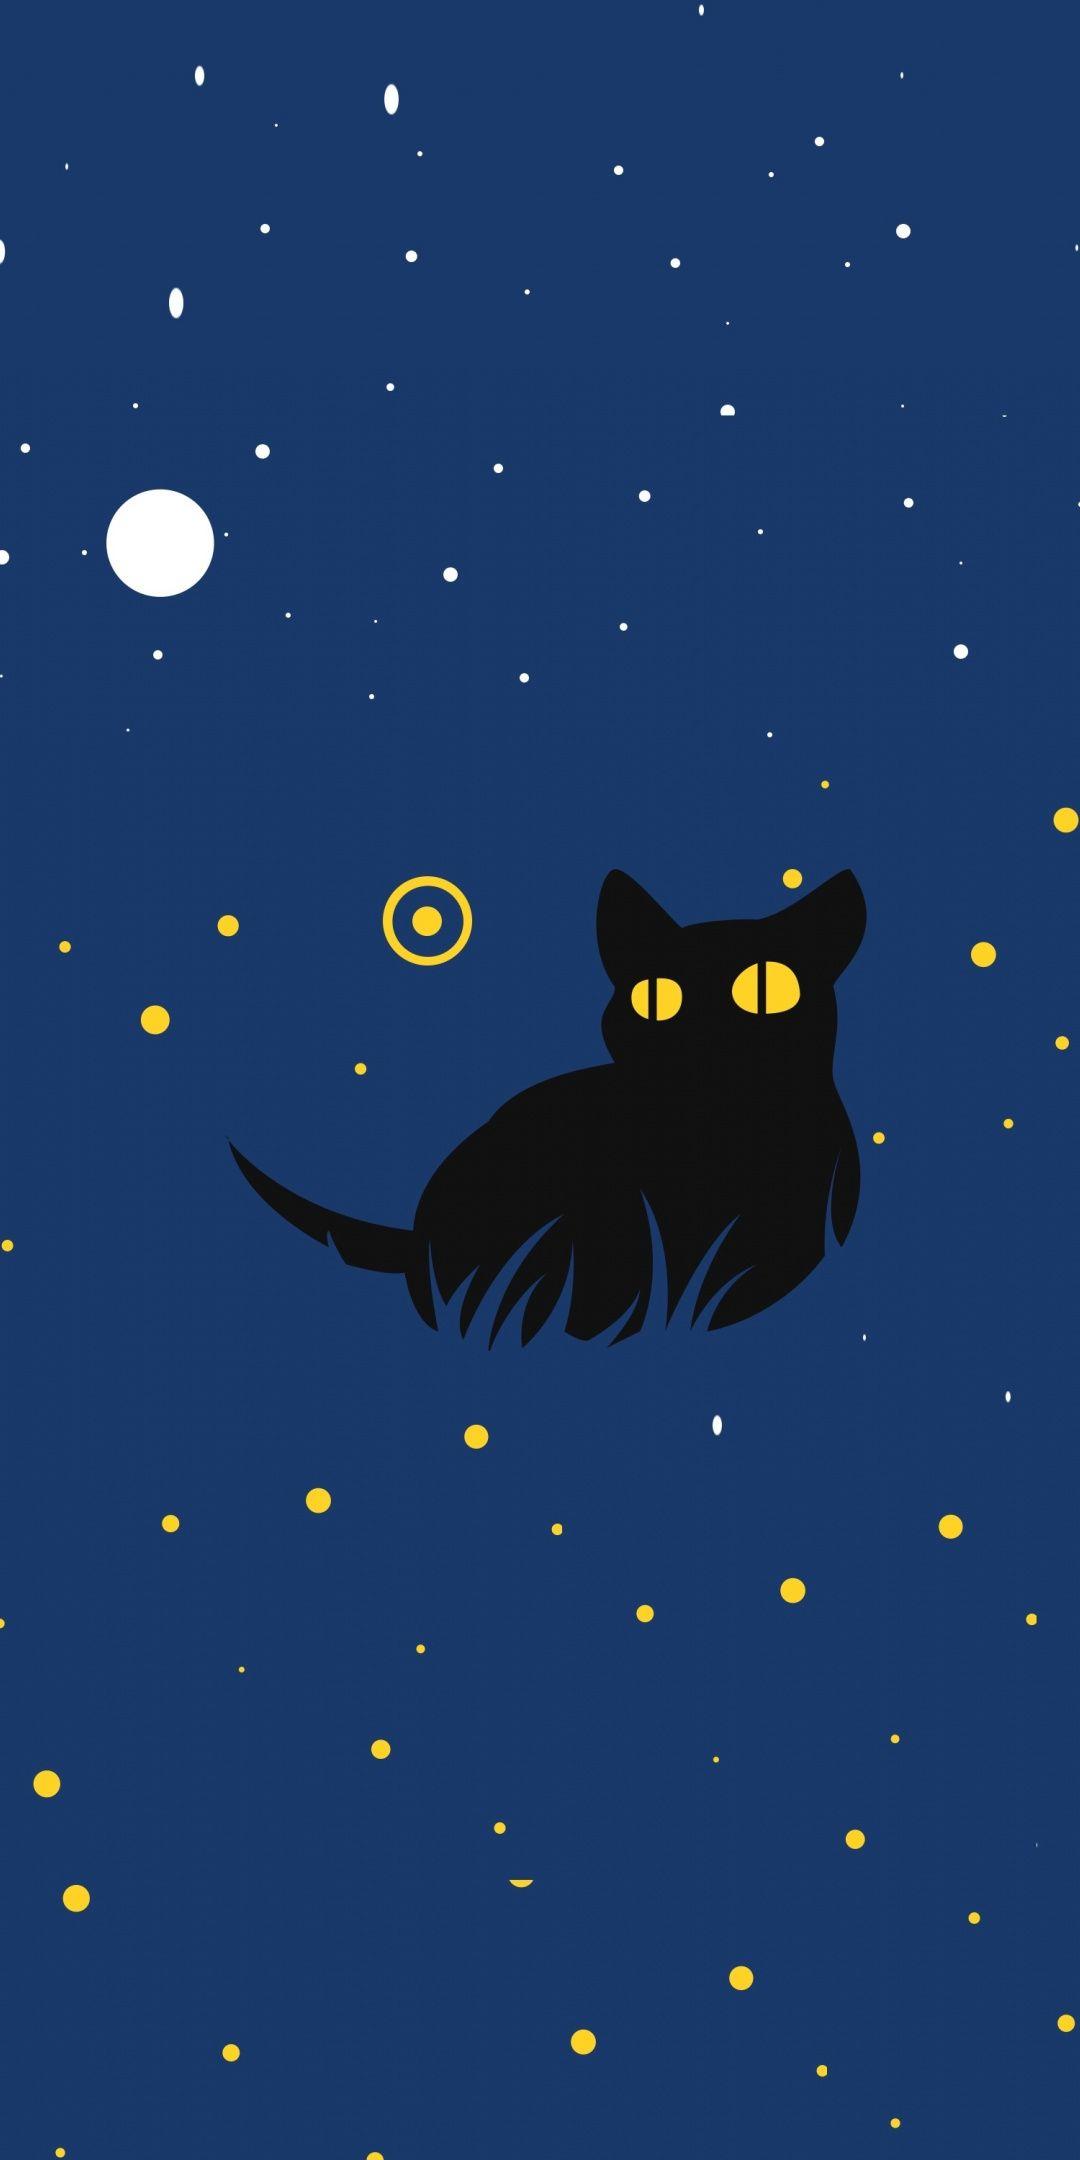 Cute Black Cat Minimal Art 1080x2160 Wallpaper Blue Anime Art Black Wallpaper Anime cat wallpaper android